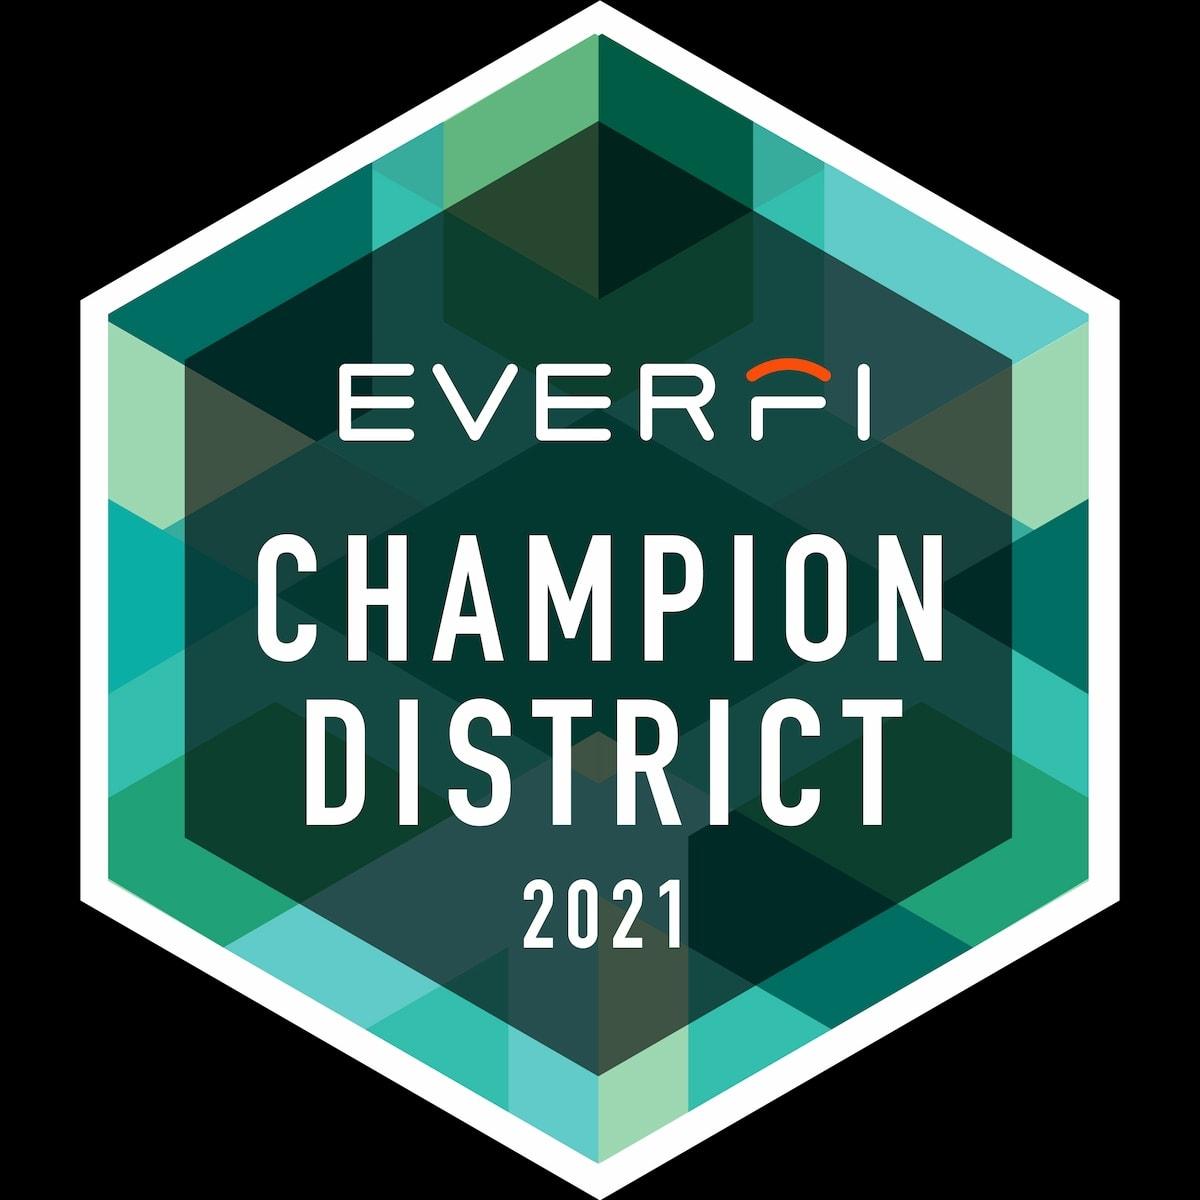 EVERFI_champion_district_seal_2021 (2)